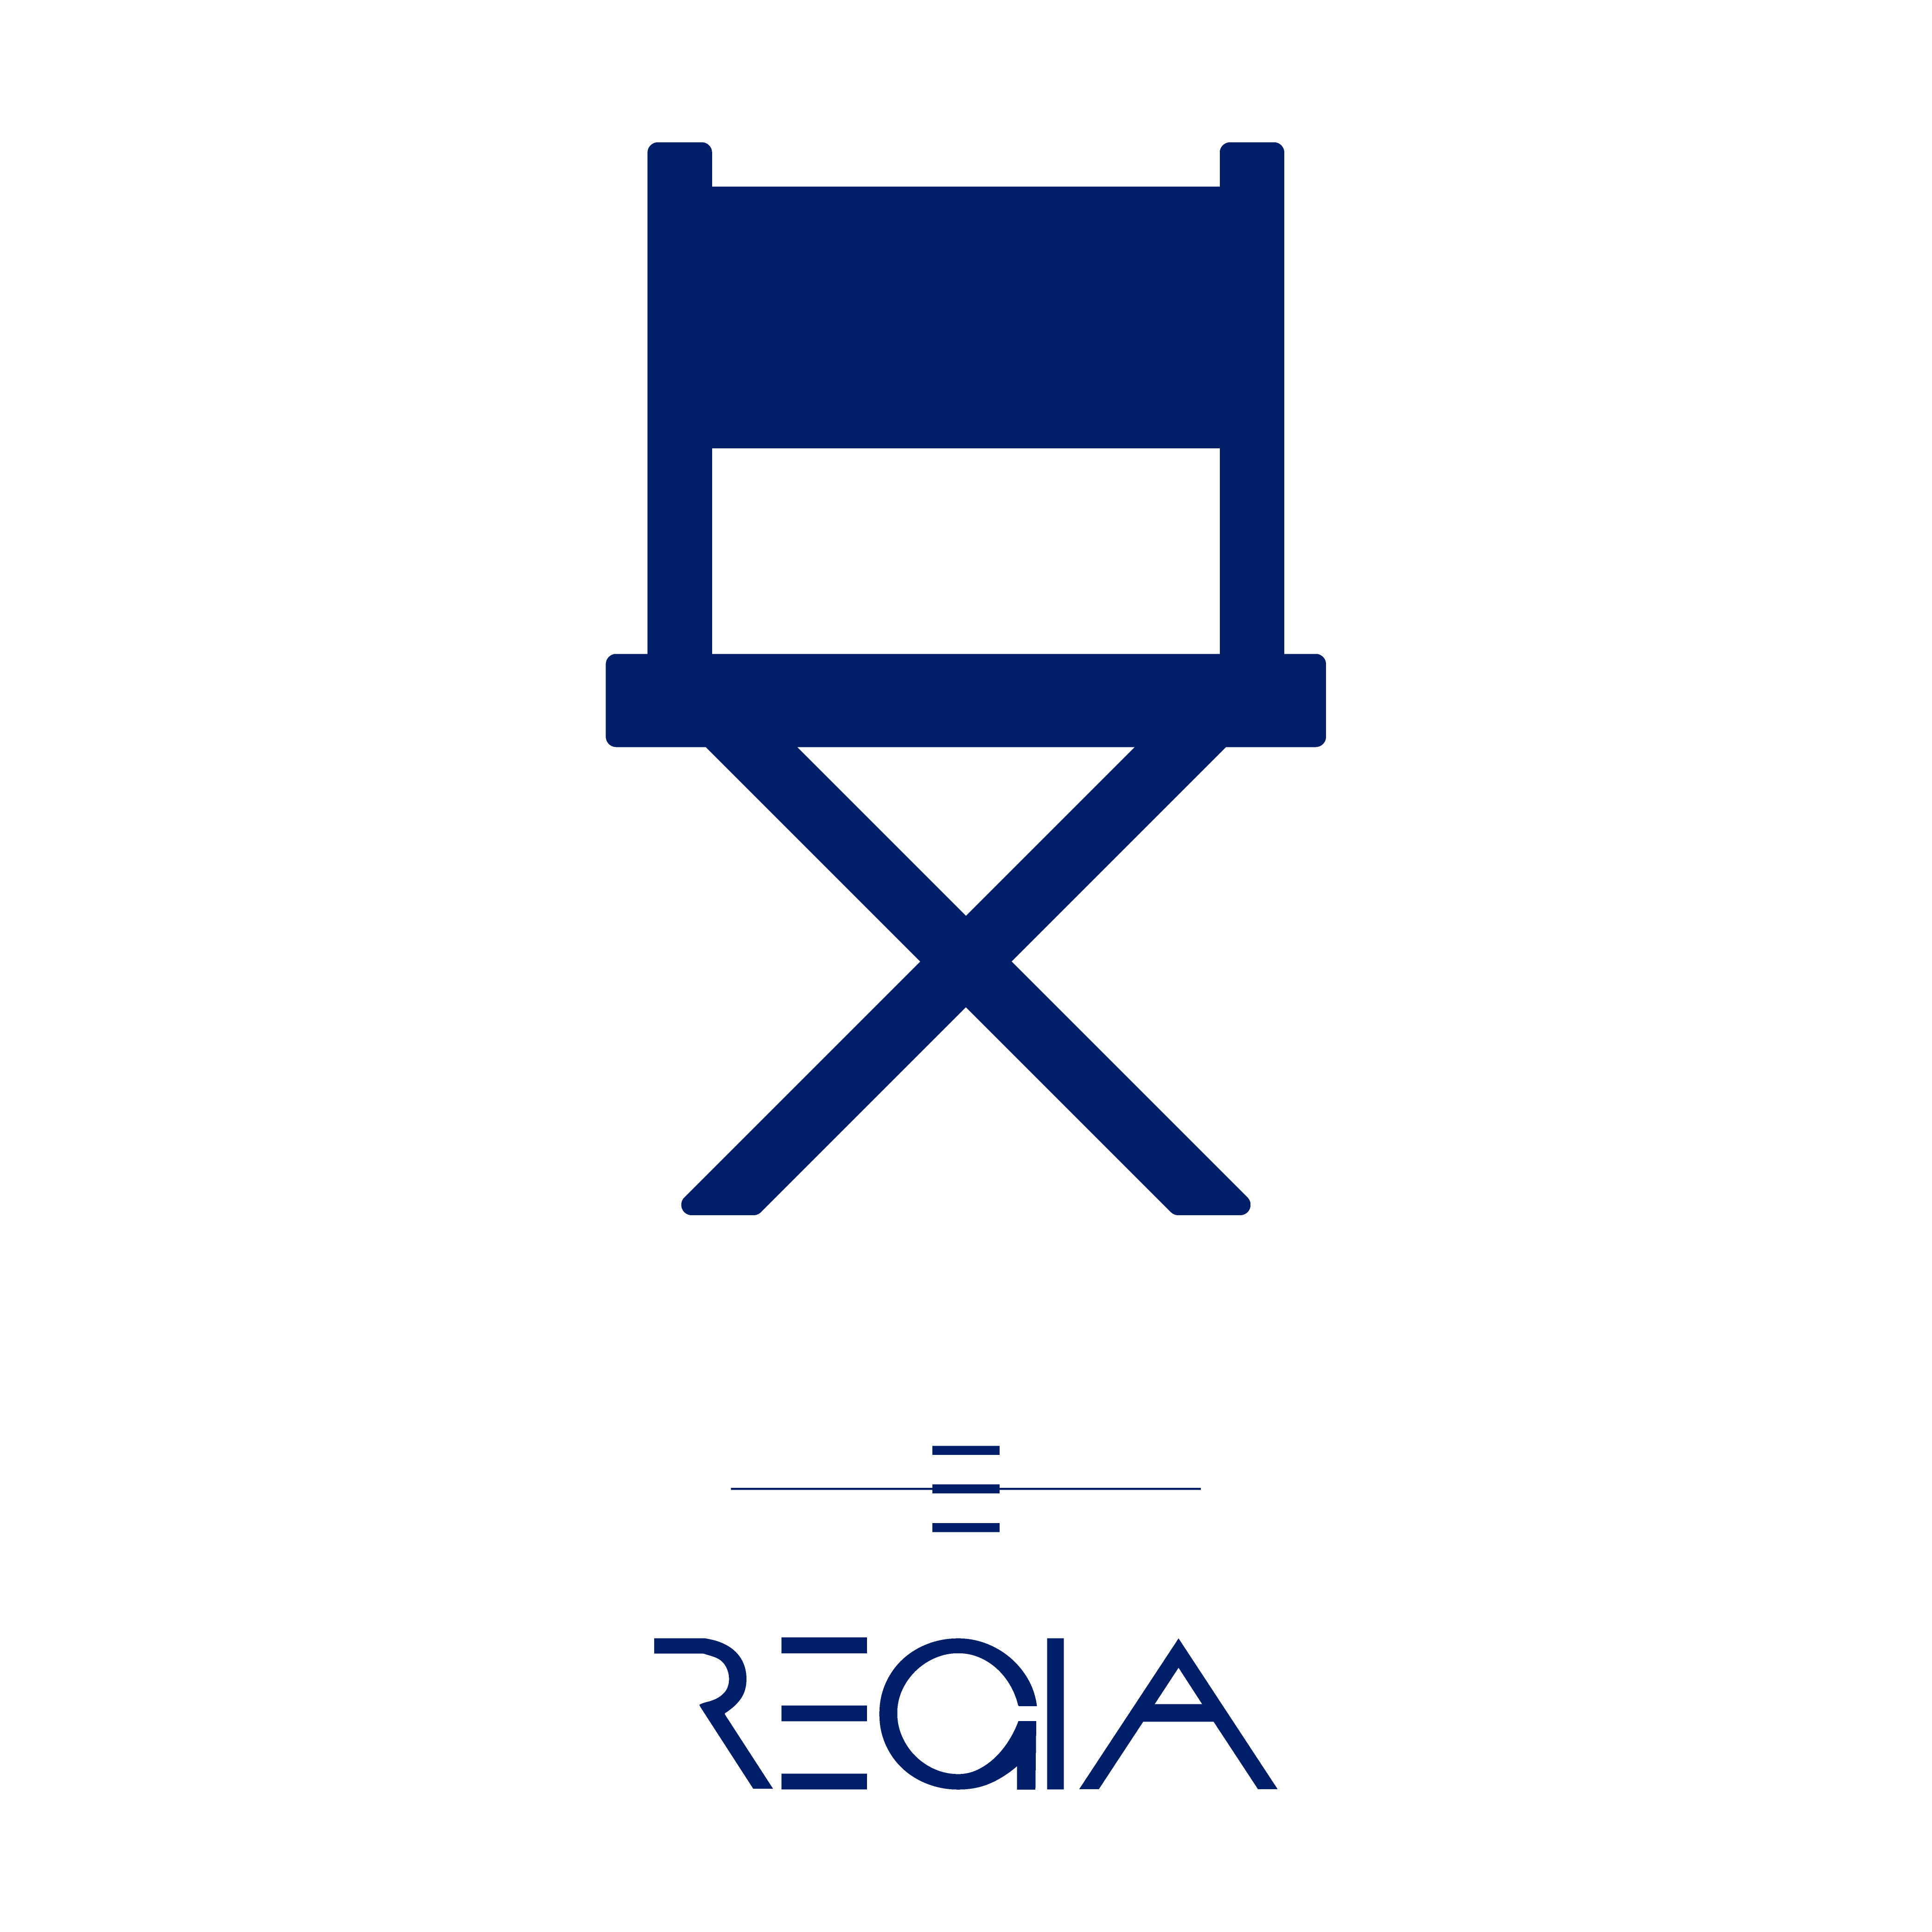 Pittogrammi Area 51 BIS Regia BLU (01 Giugno 2021)